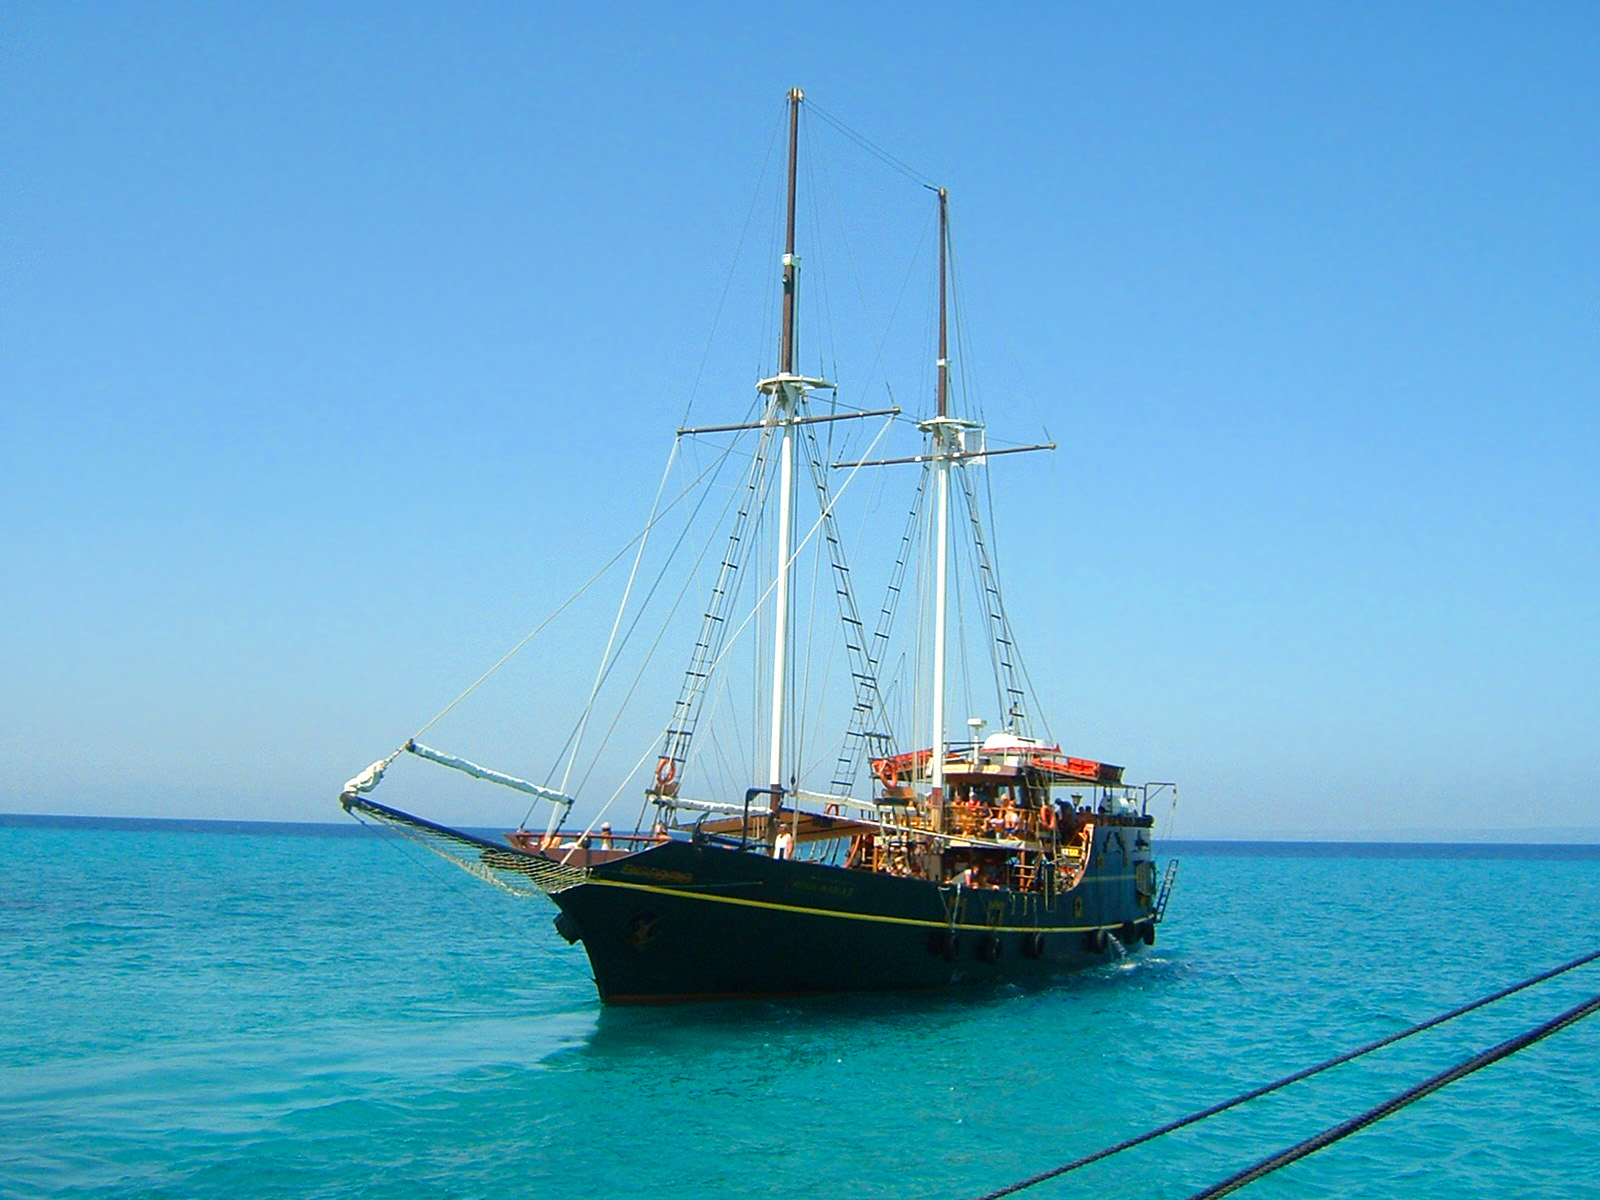 File:Tourist ship.jpg - Wikipedia